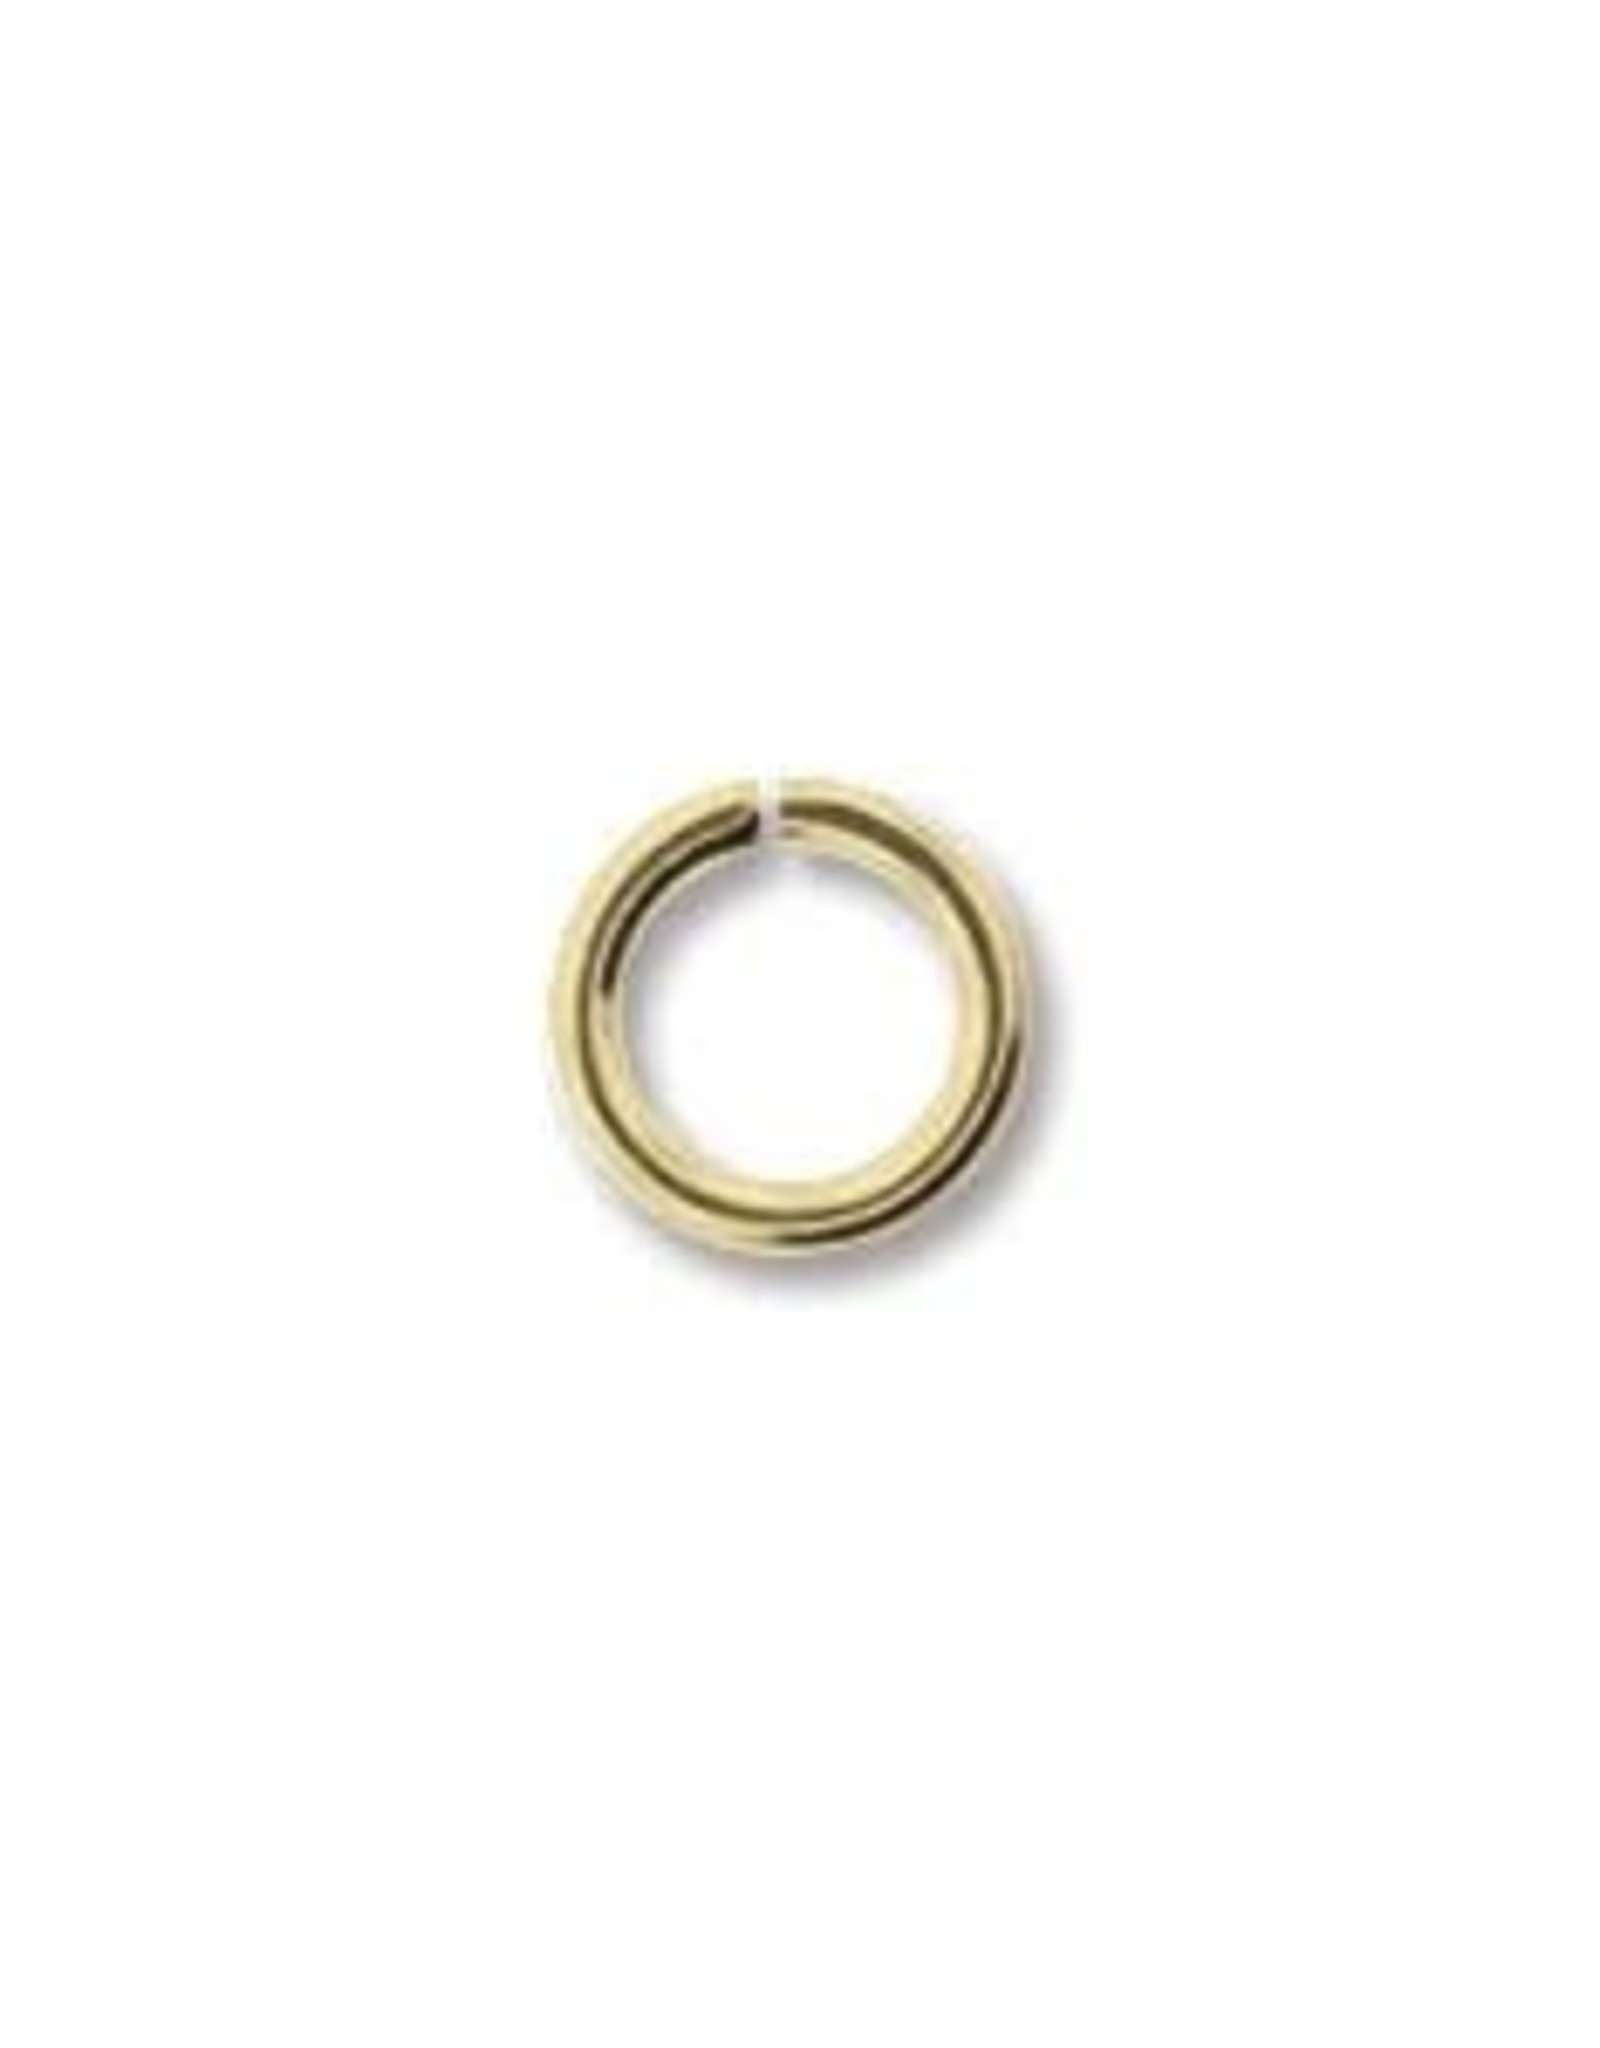 6mm Jump Ring 18 ga Gold Plate Qty 24